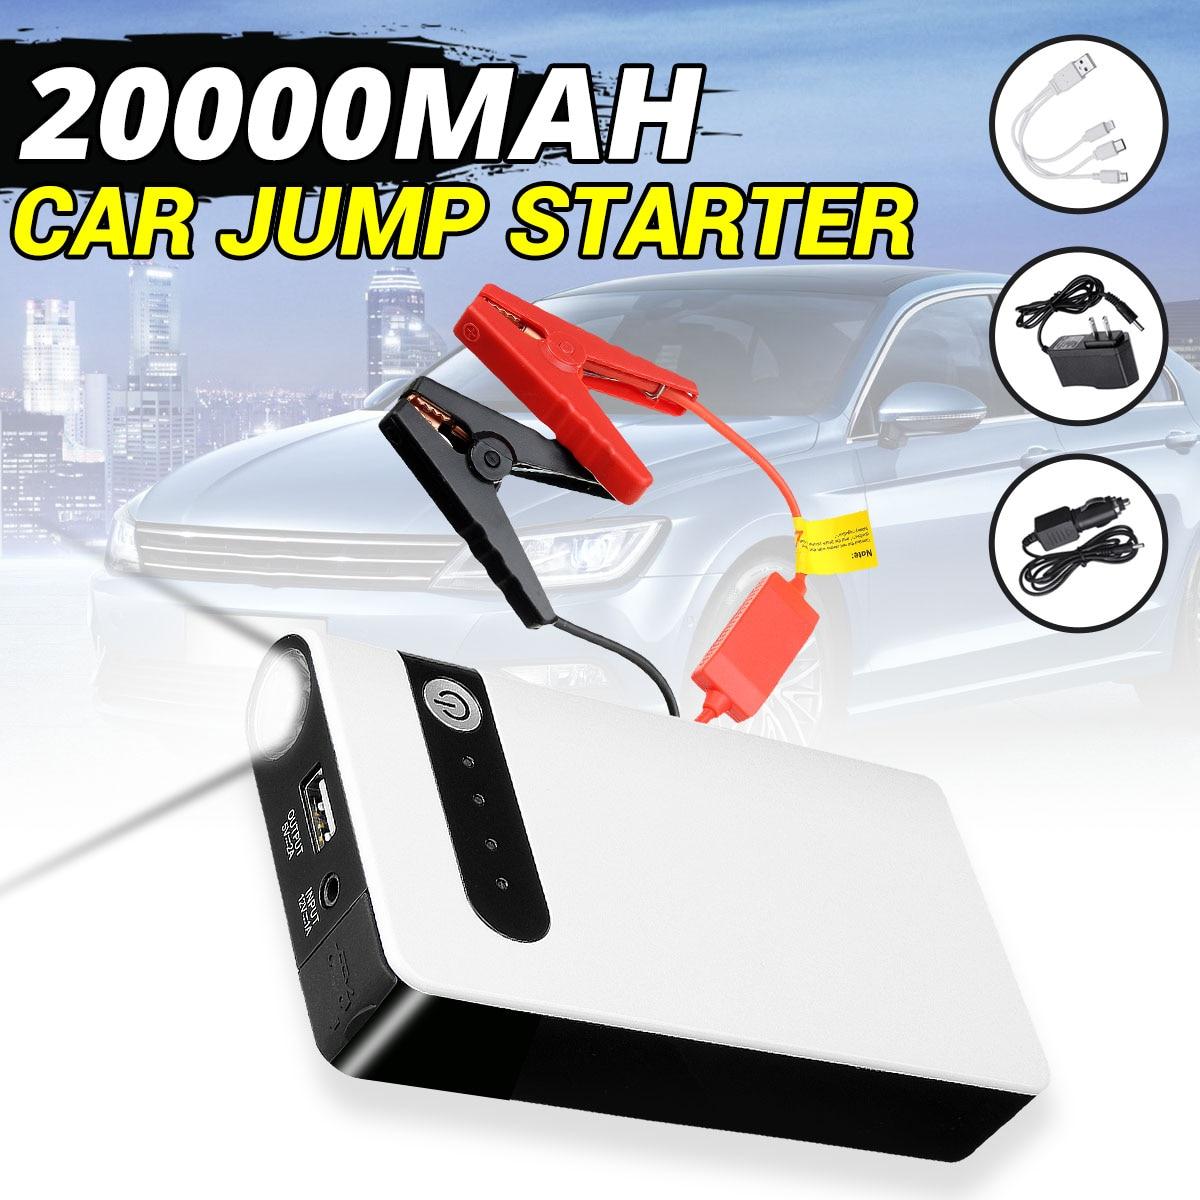 Car Jump Starter Booster Jumper Box USB Power Bank Battery Charger 12V 20000mAh Emergency Starting Device